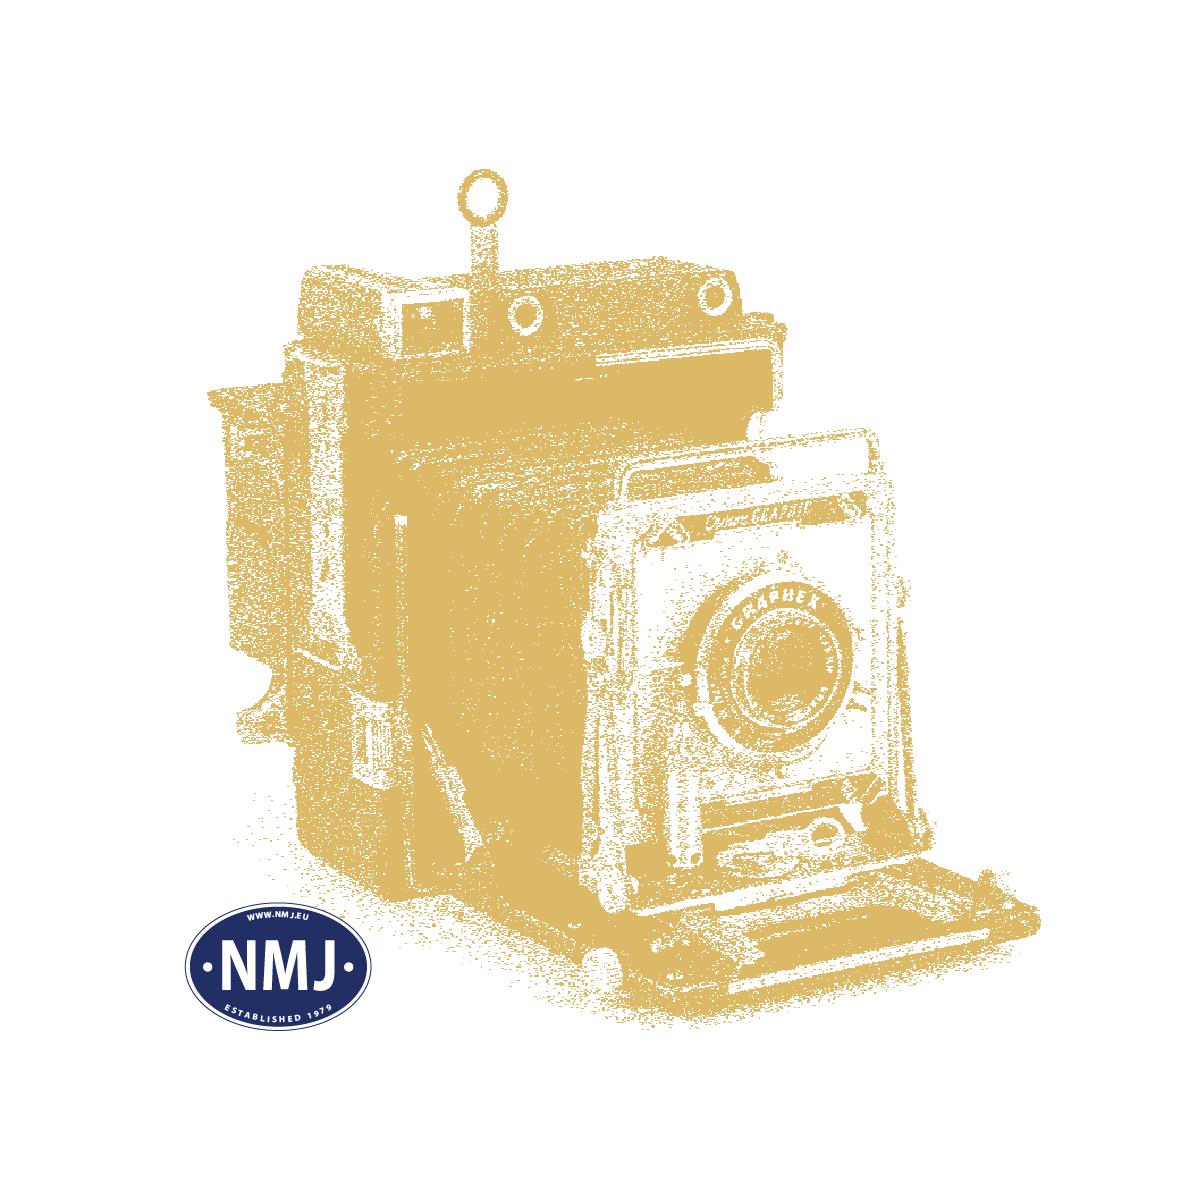 NMJH15122 - NMJ Skyline Norsk Enebolig med underetasje, Gul/Hvit, Ferdigmodell